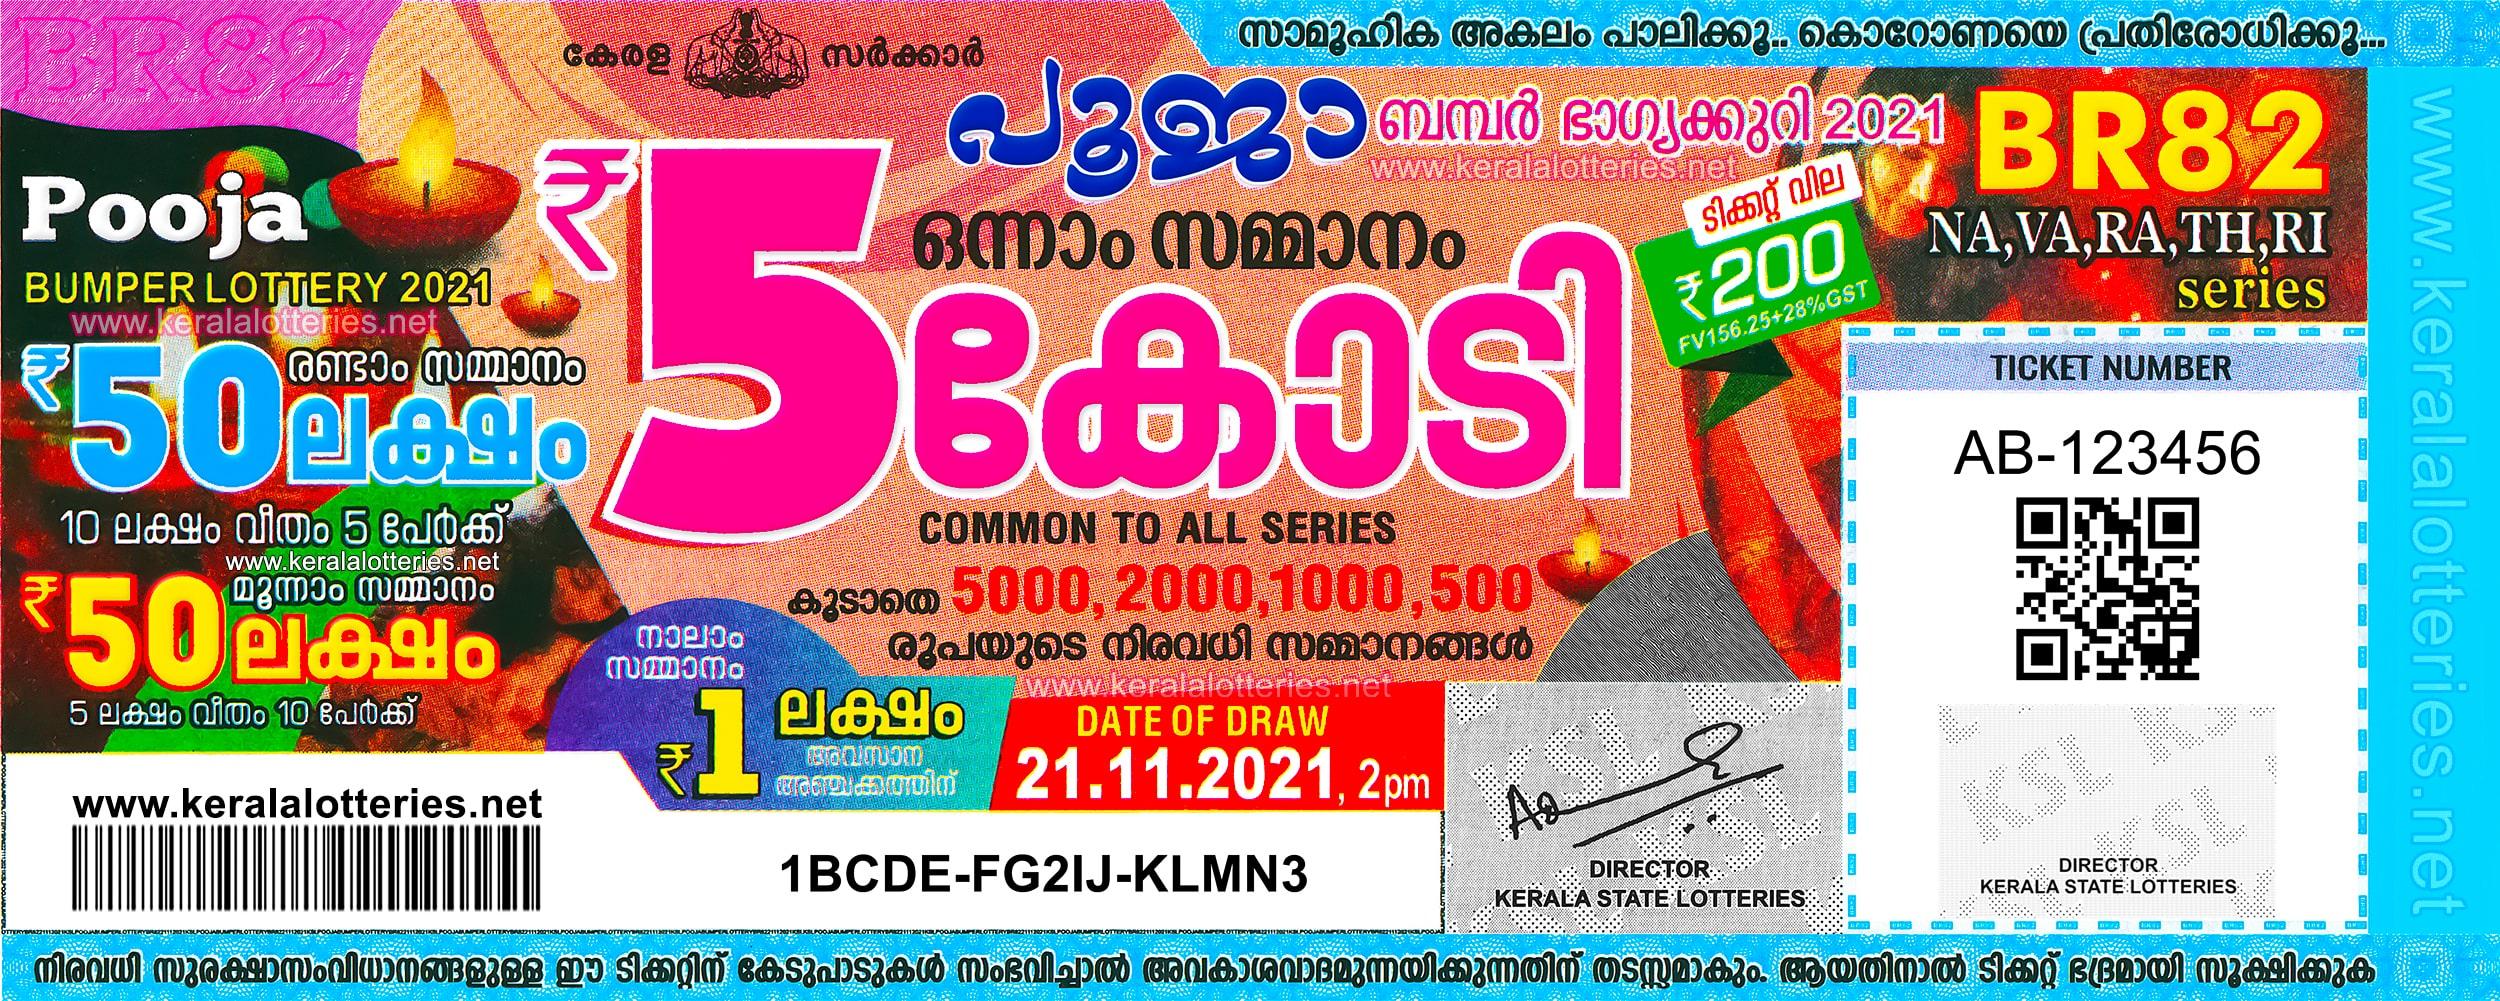 Kerala Pooja Bumper BR 82 Prize Structure 2021